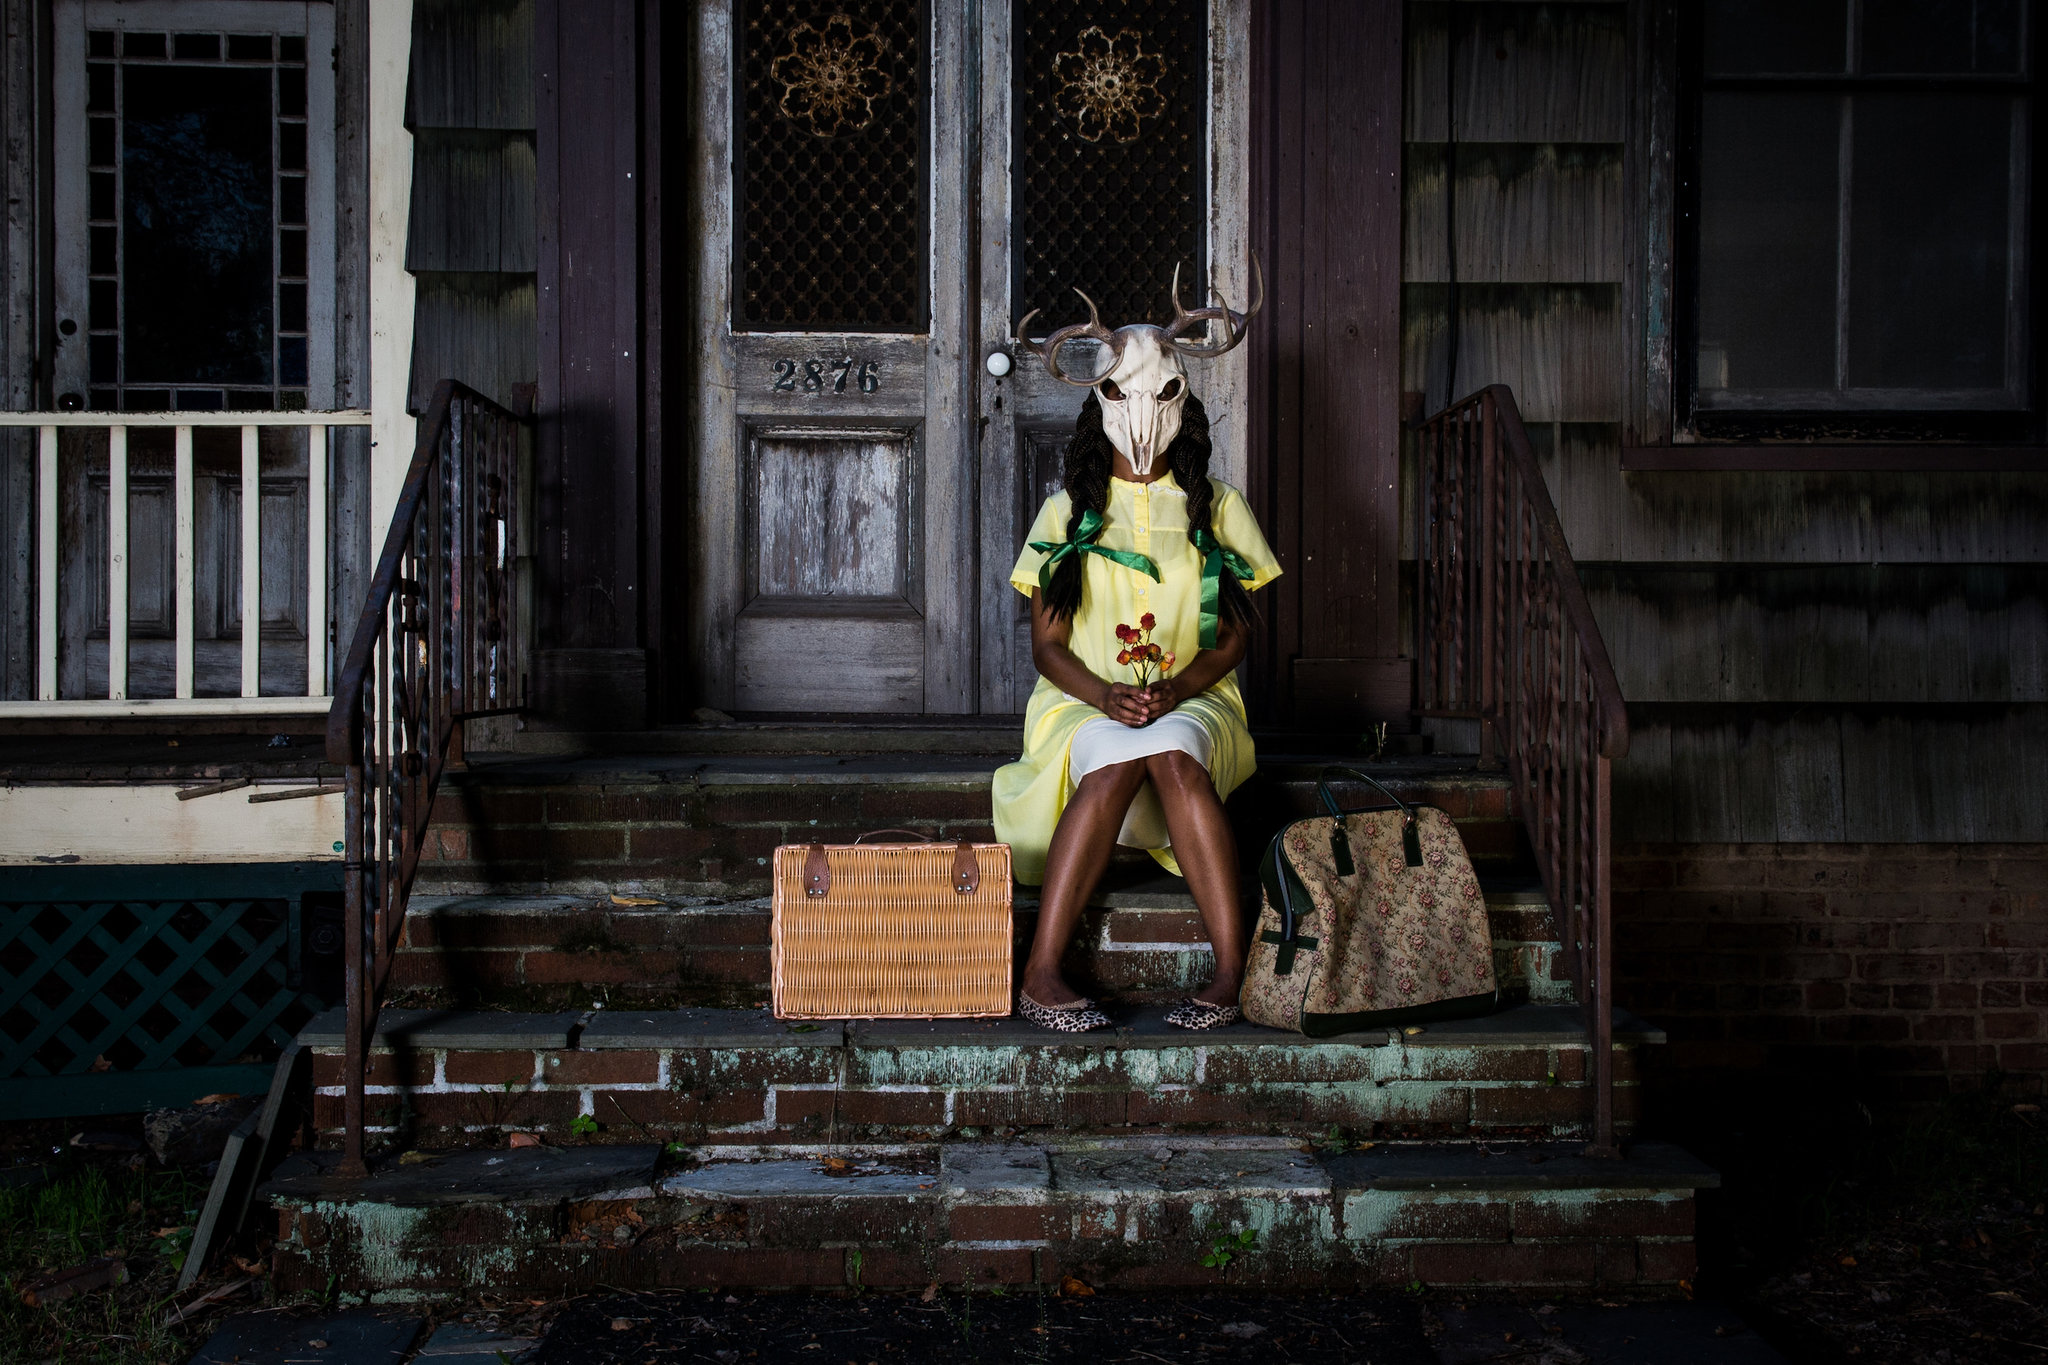 African American Art, Black Art, Allison Janae Hamilton, KINDR'D Magazine, KINDR'D, KOLUMN Magazine, KOLUMN, Willoughby Avenue